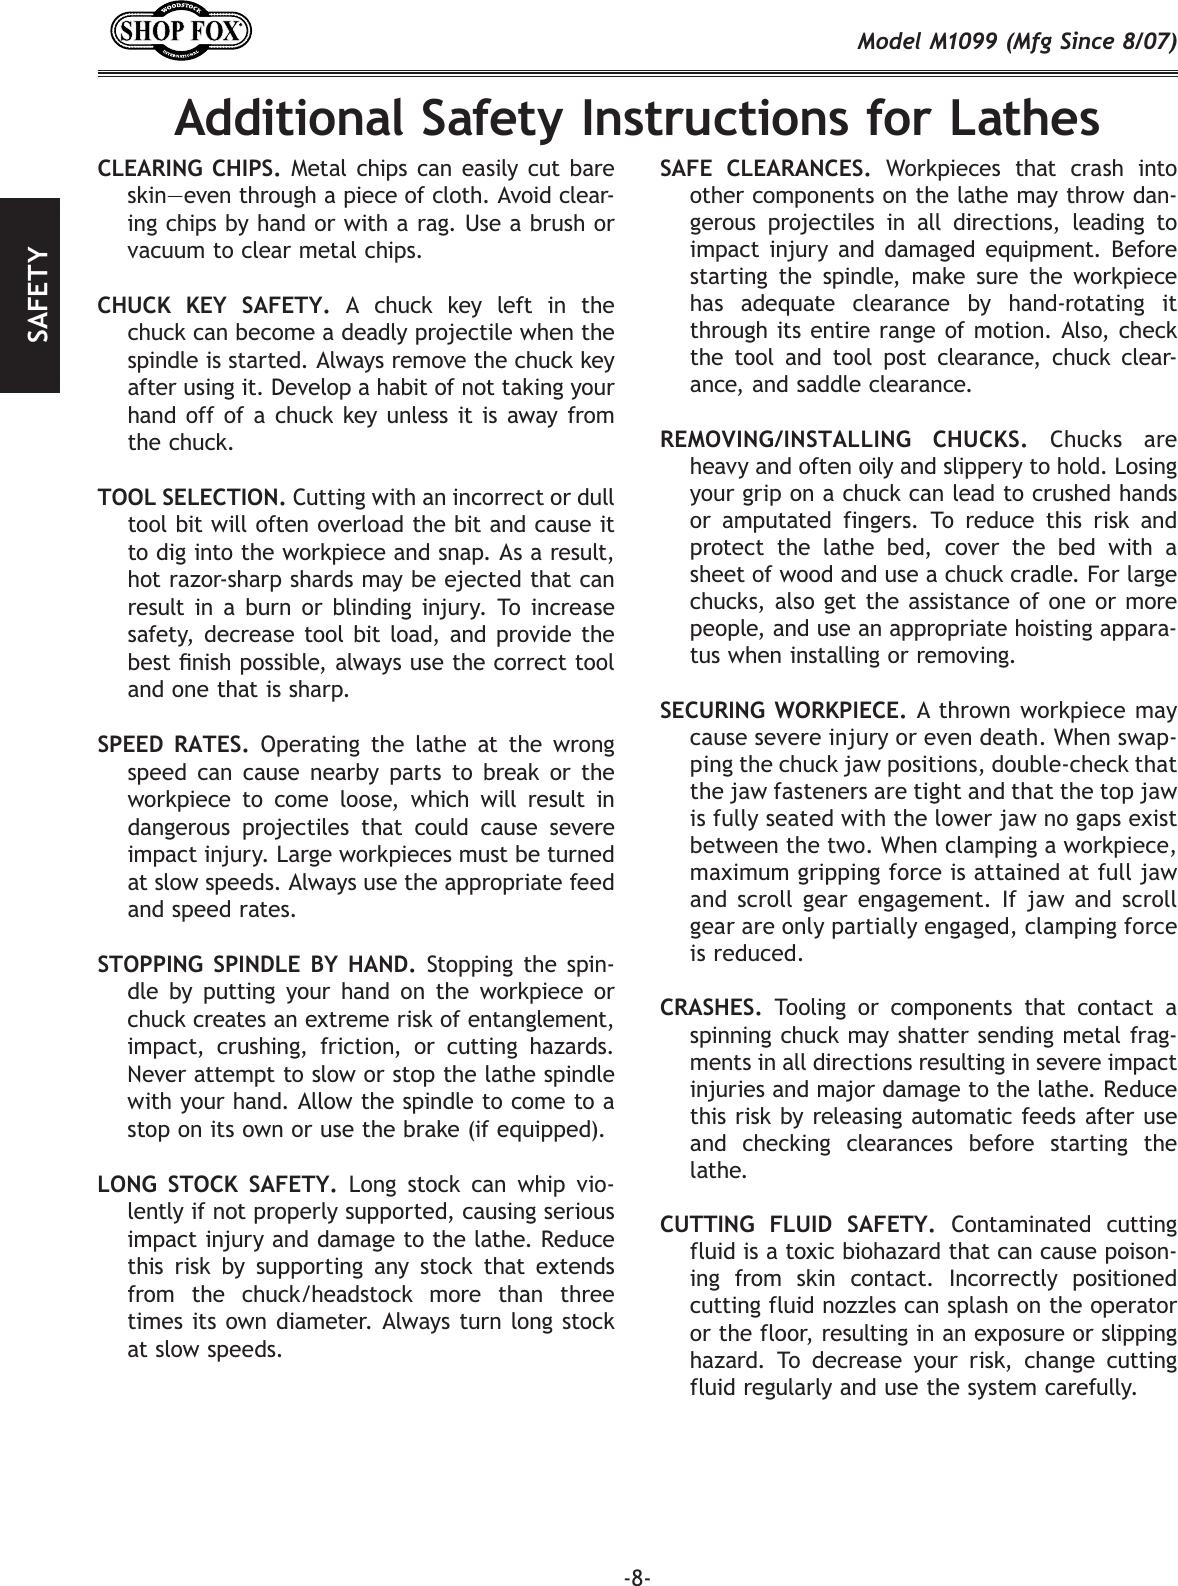 Woodstock Shop Fox M1099 Users Manual M1099_m